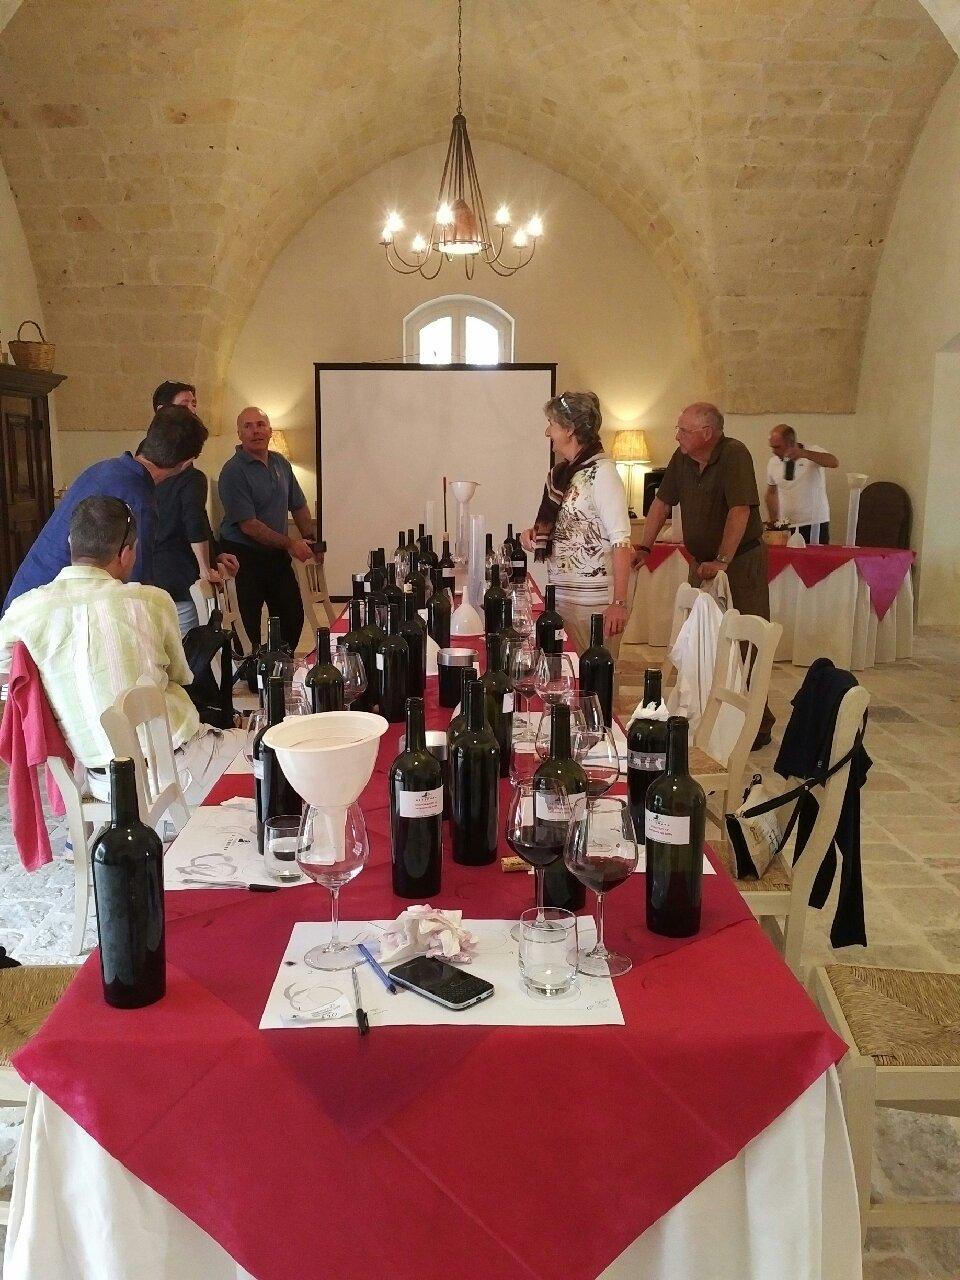 wine blending activity